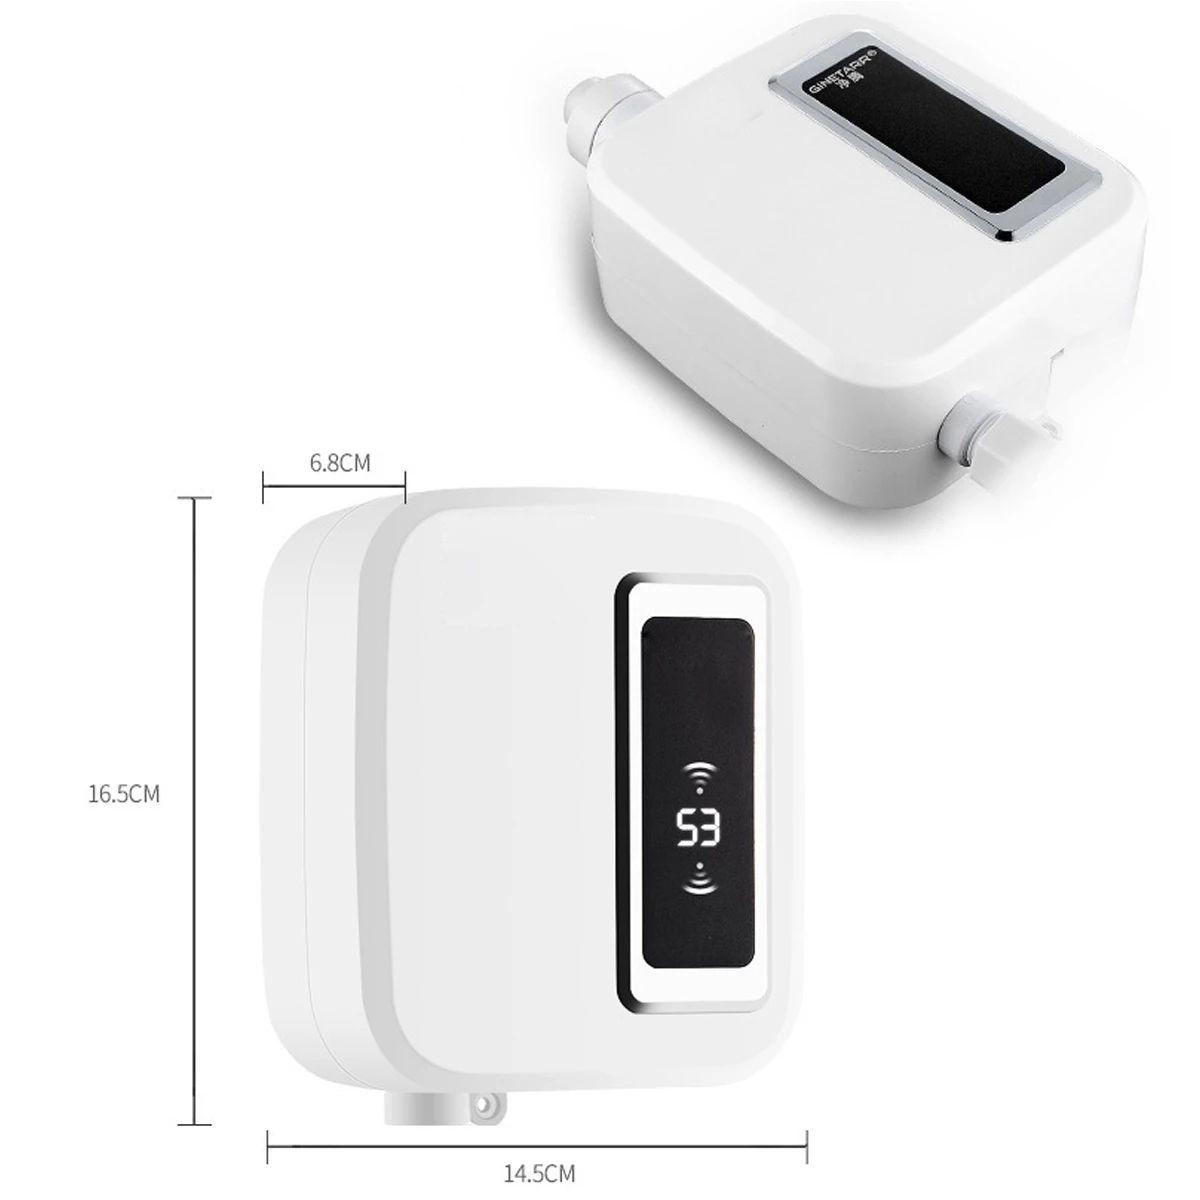 calentador de agua FreeShipping 3500W Calentador eléctrico de agua instantáneo Tankles caliente mini calentador con pantalla LCD enchufe de la UE para la cocina Baño Casa